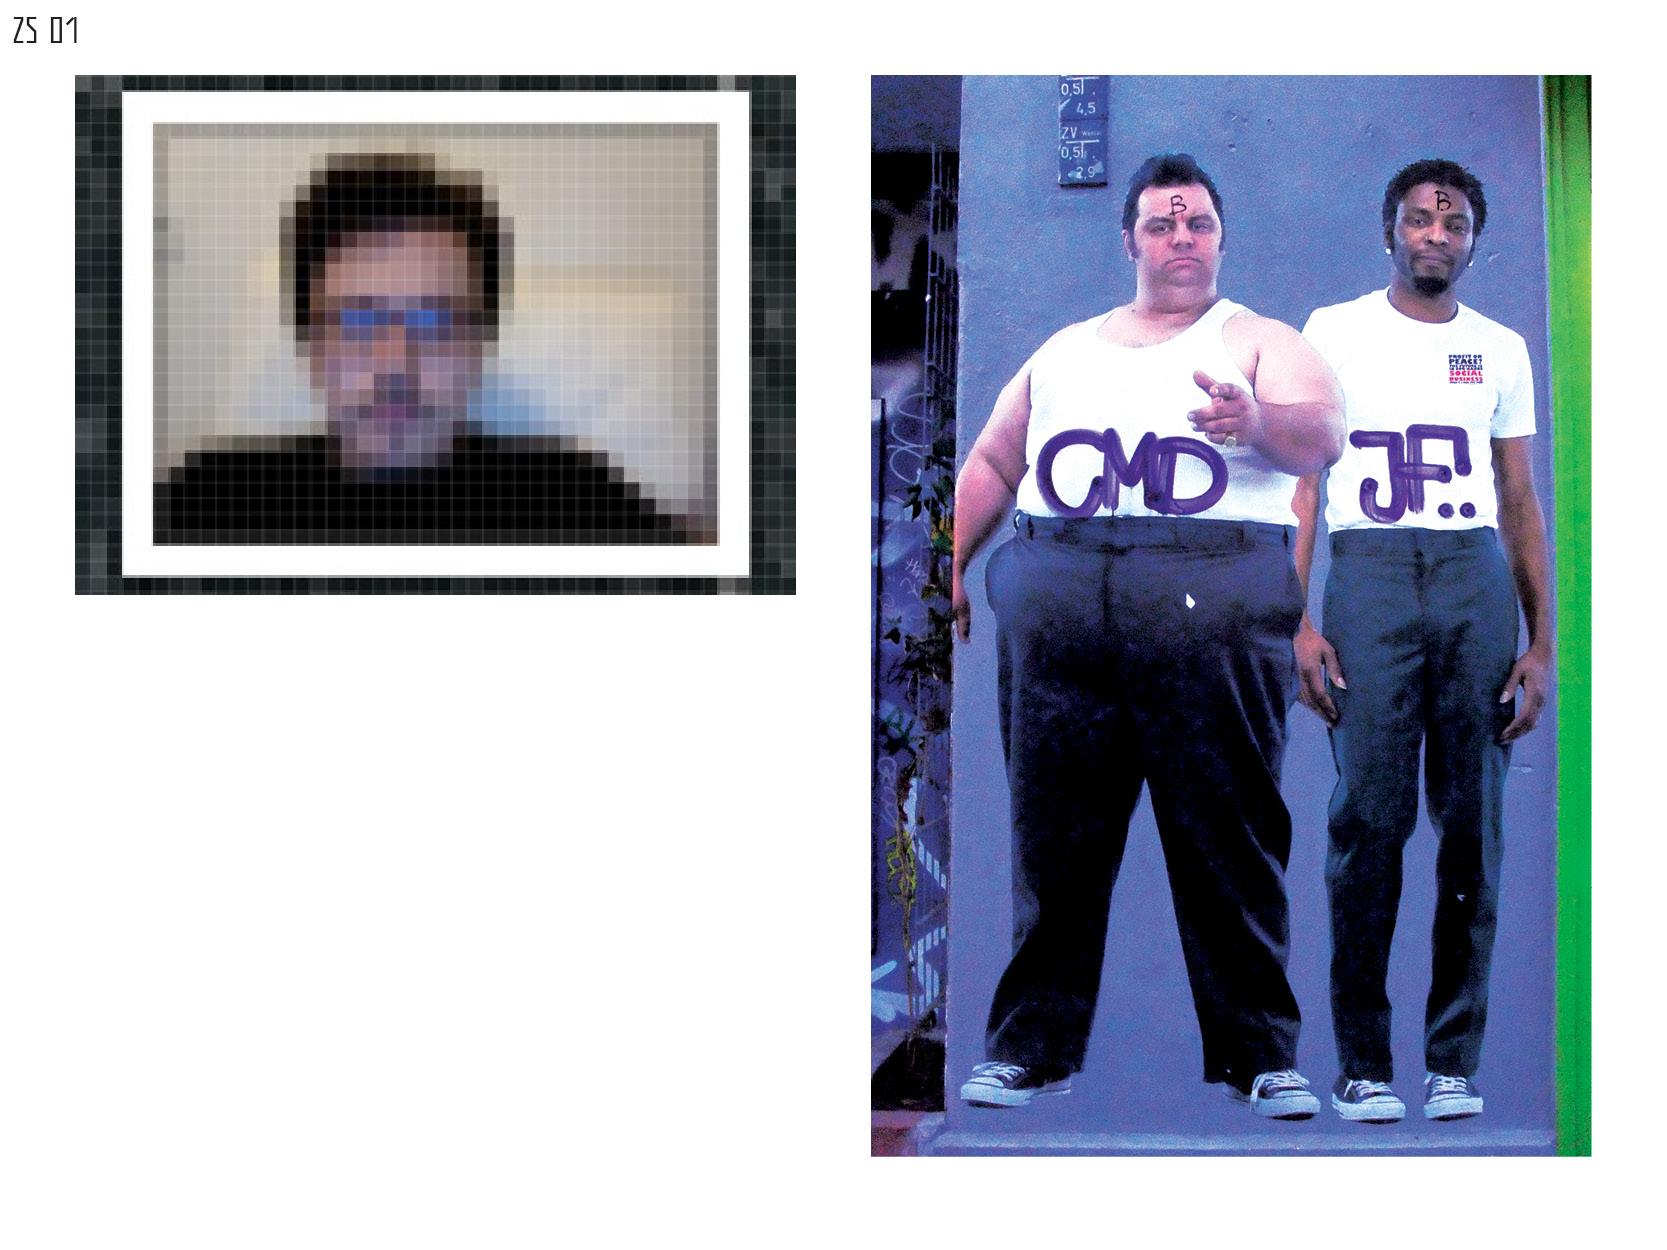 Gerrit-Schweiger-Dialog-Städte-Paris-Berlin-Jessica-Blank-Experiment-Fotoserie-Tagebuch-visuelle-Kommunikation-86